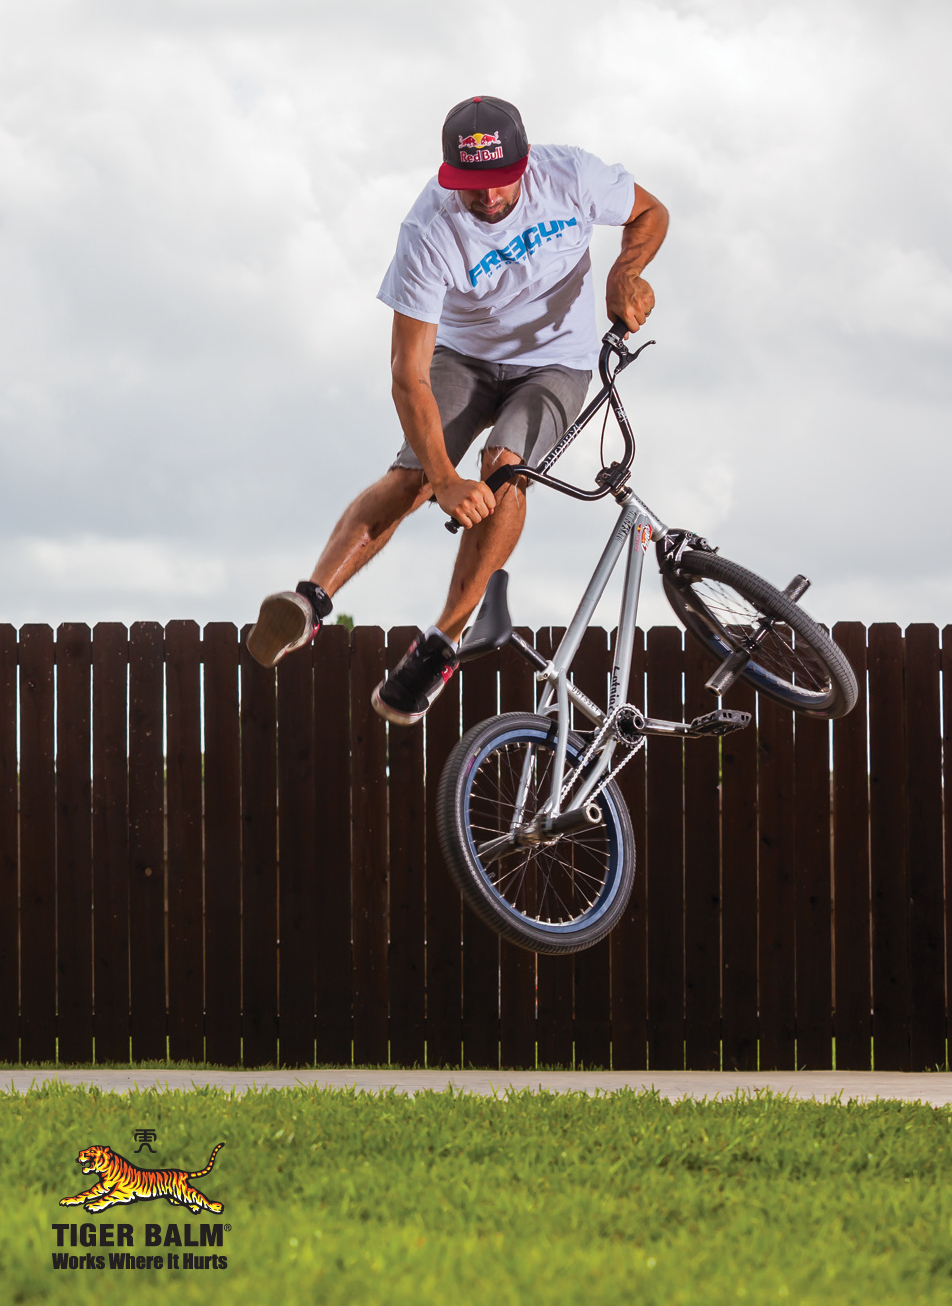 Professional flatland BMX rider Terry Adams (Photo: Business Wire)